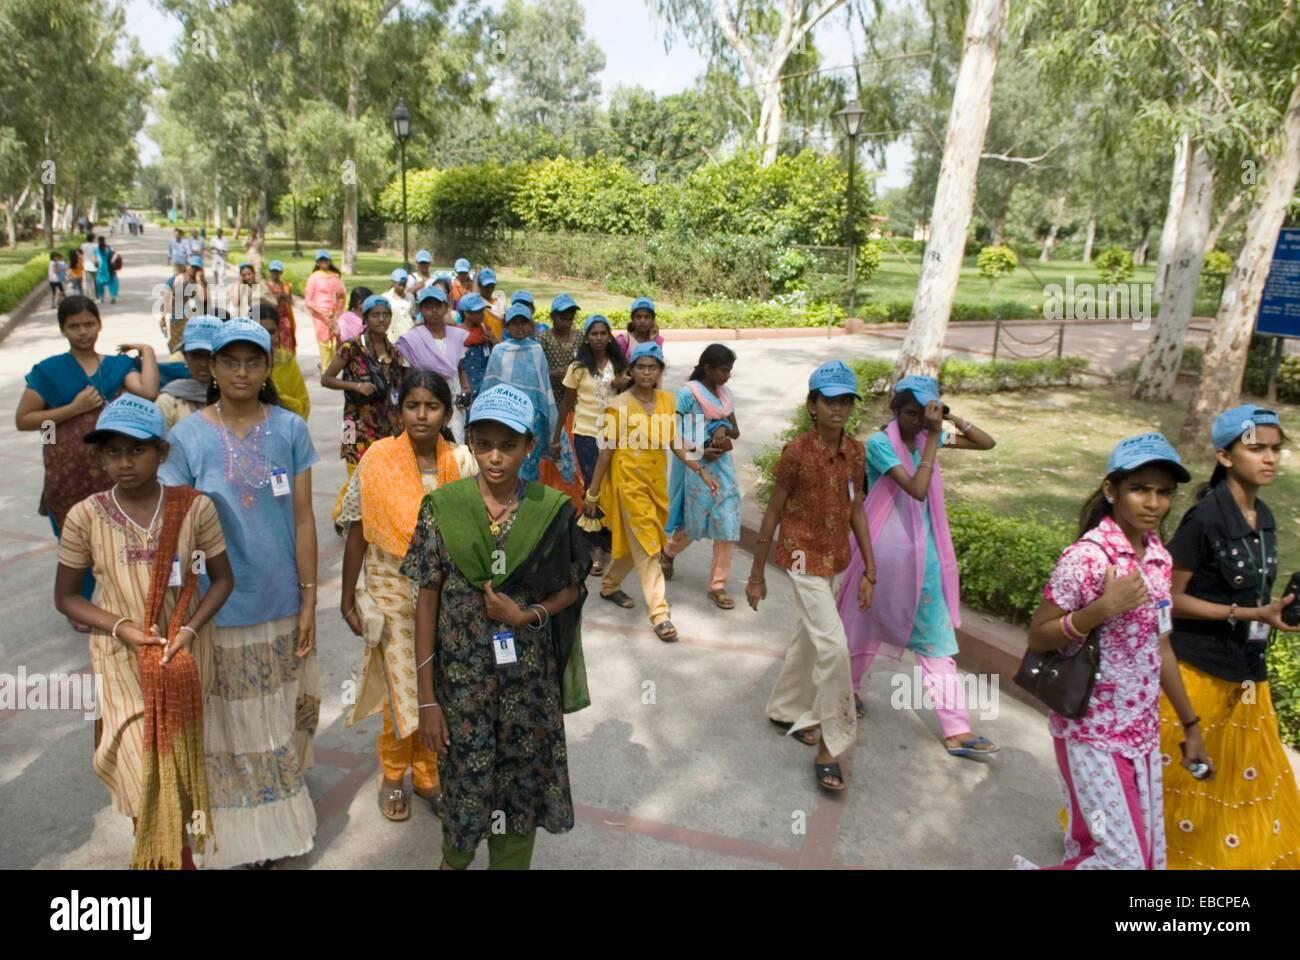 schoolgirls group visiting the Raj Ghat, memorial to Mahatma Gandhi, Old Delhi, India, Asia - Stock Image